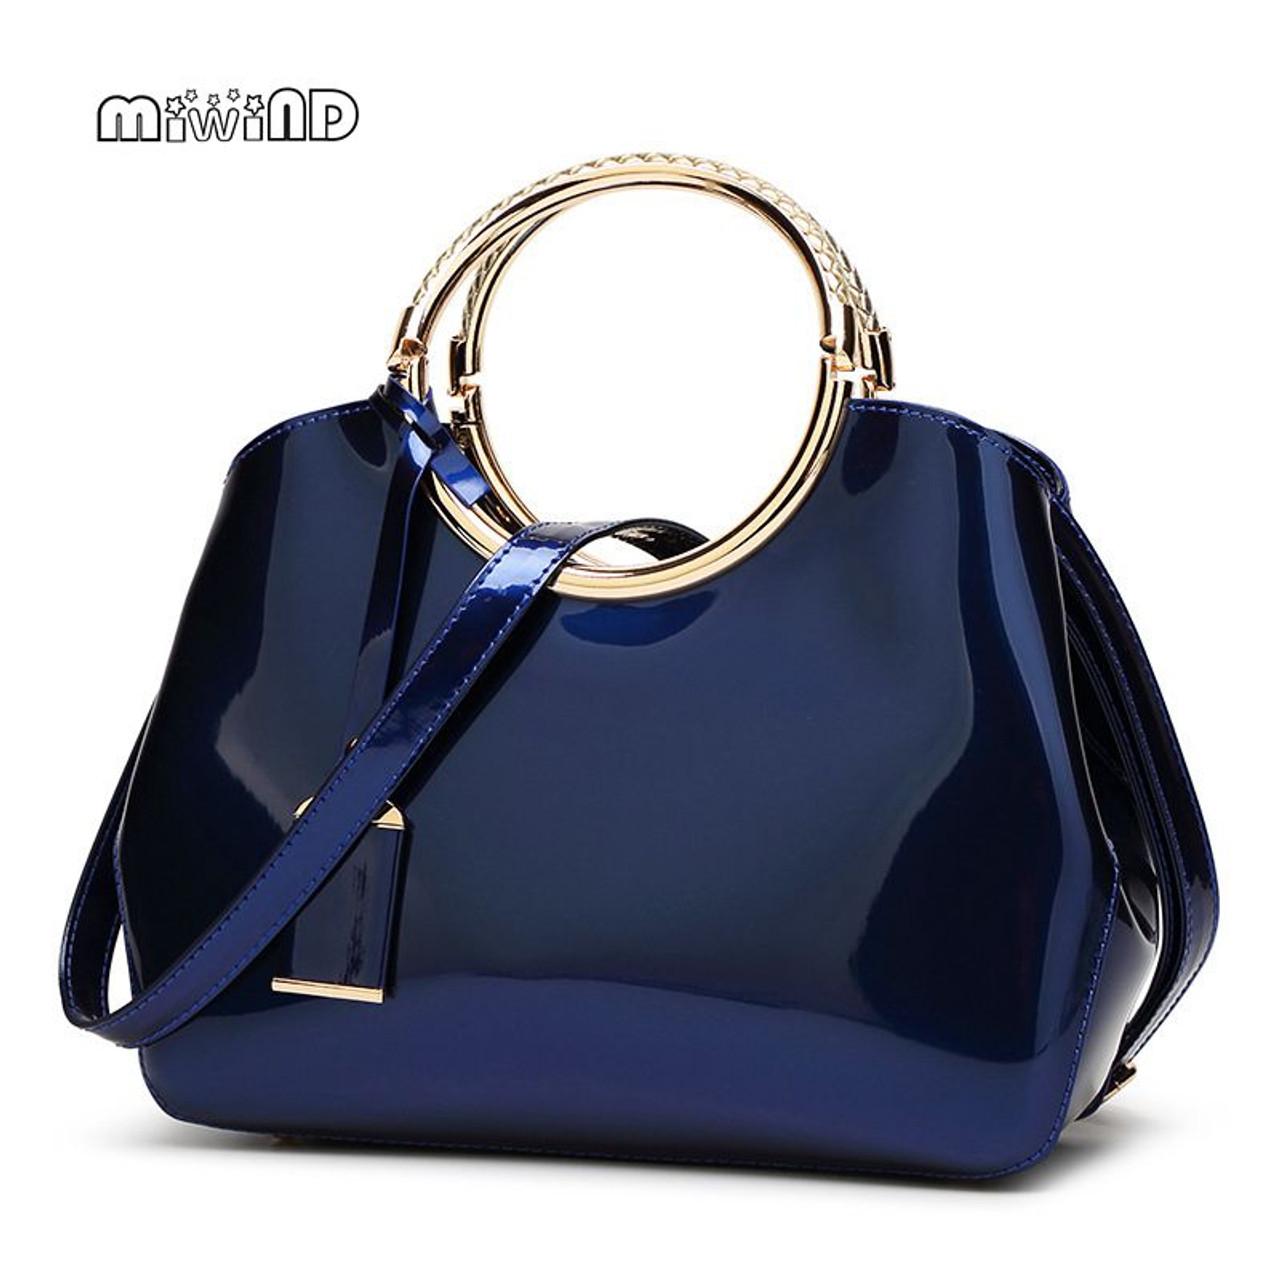 2018 High Quality Patent Leather Women Bag Ladies Cross Body Messenger  Shoulder Bags Handbags Women Famous Brands Bolsa Feminina - OnshopDeals.Com 21e780d242